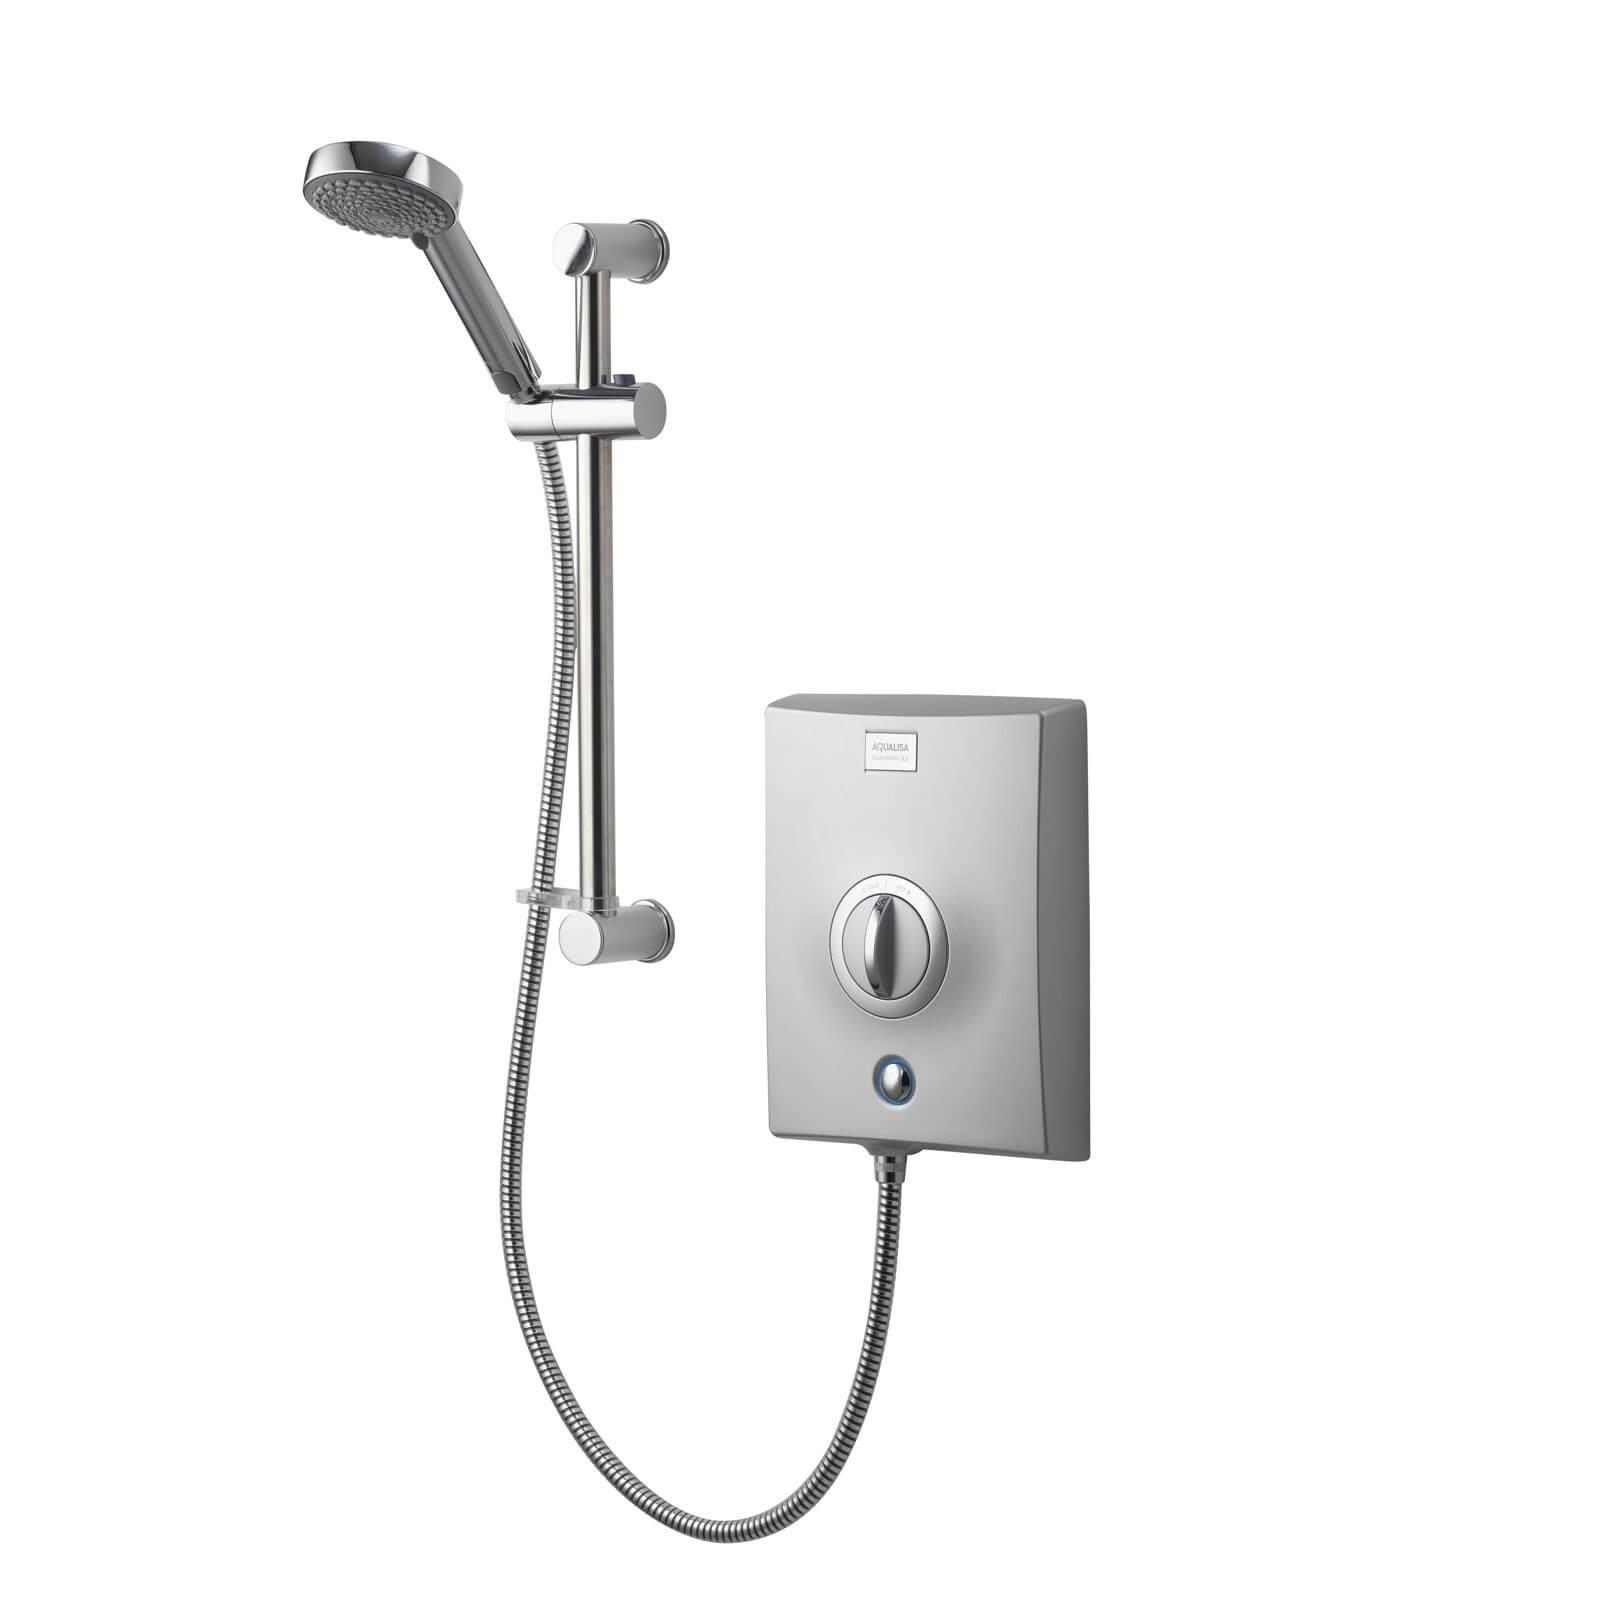 Aqualisa Quartz 8.5kW Electric Shower - Chrome